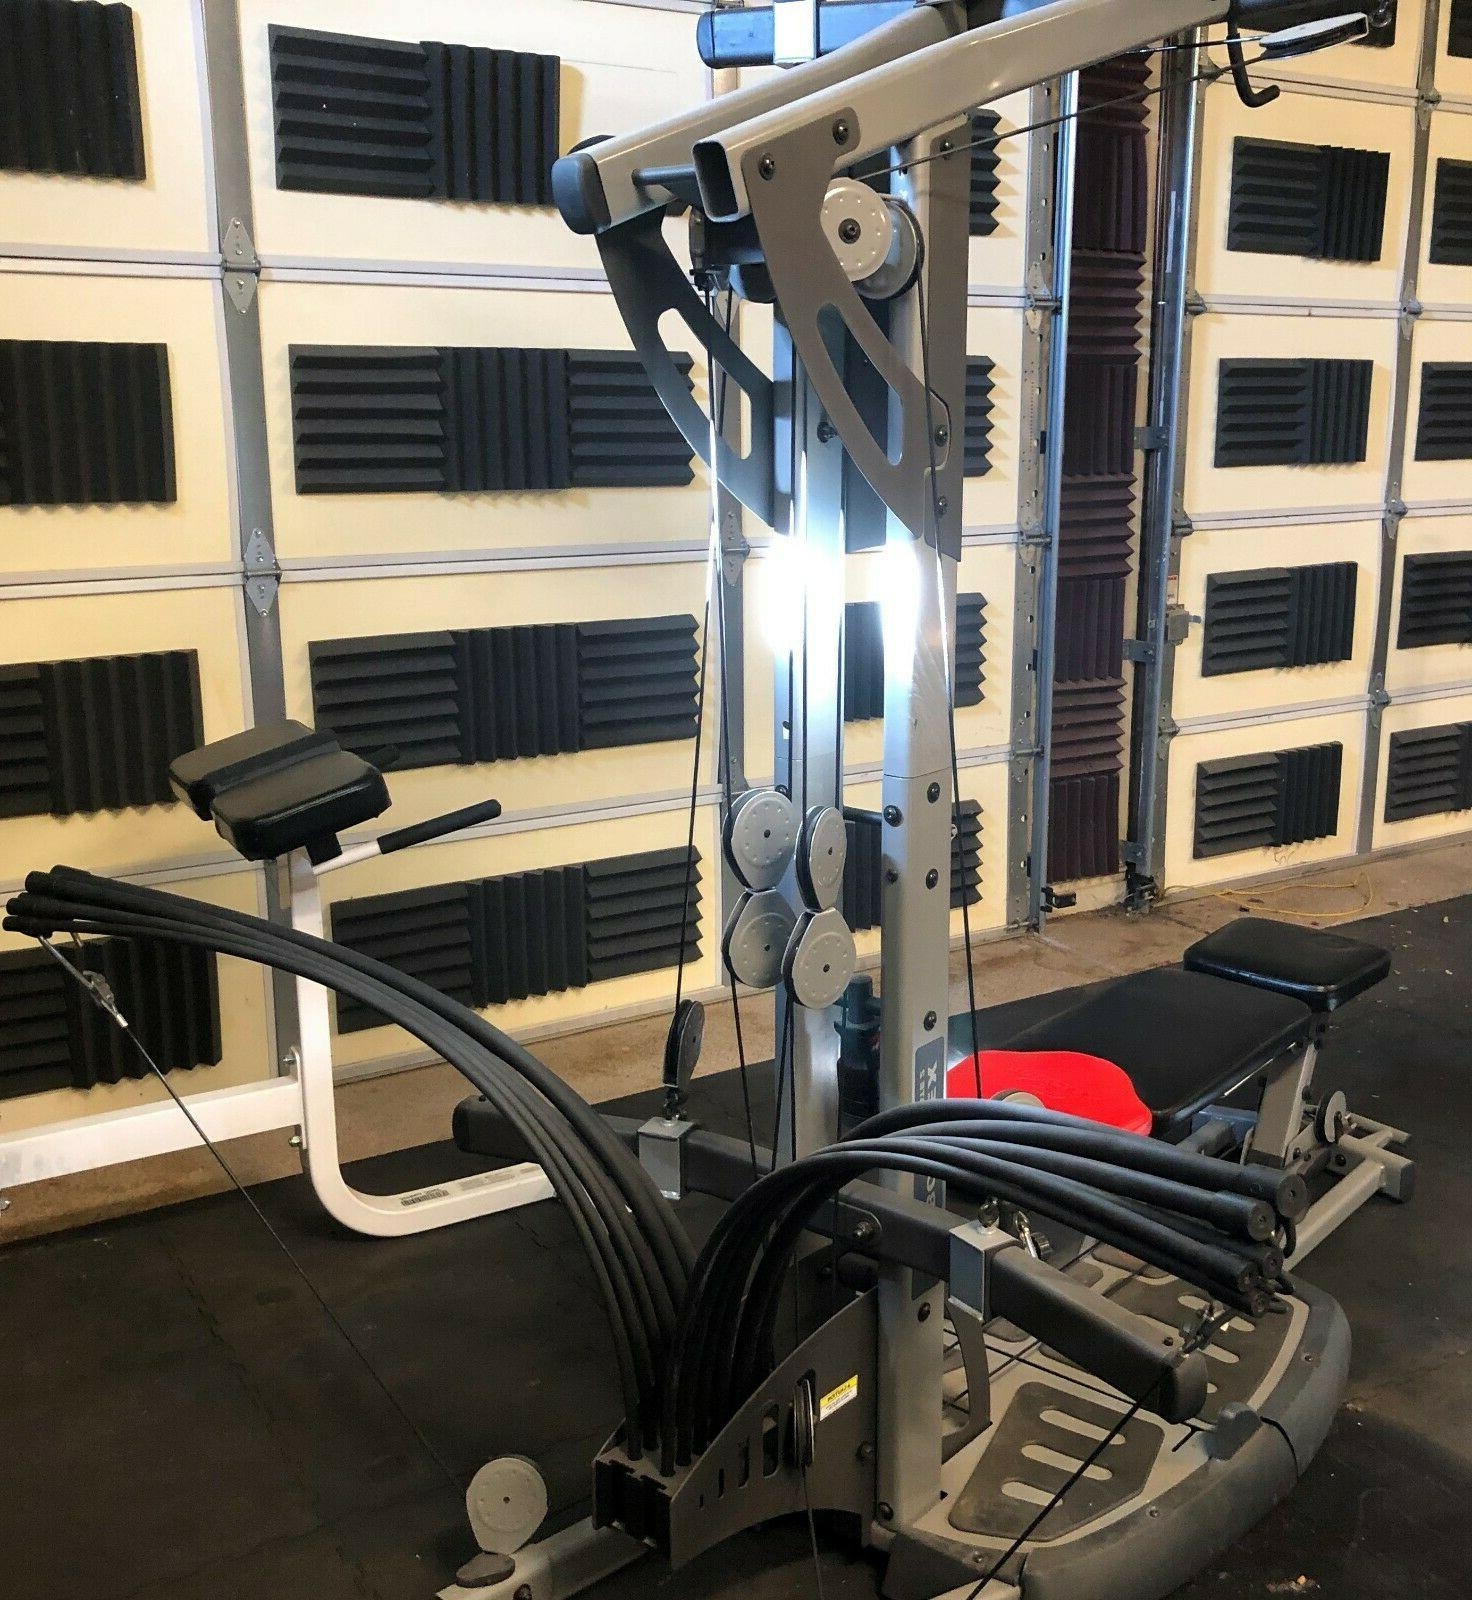 Bowflex Gym. Great All accessories